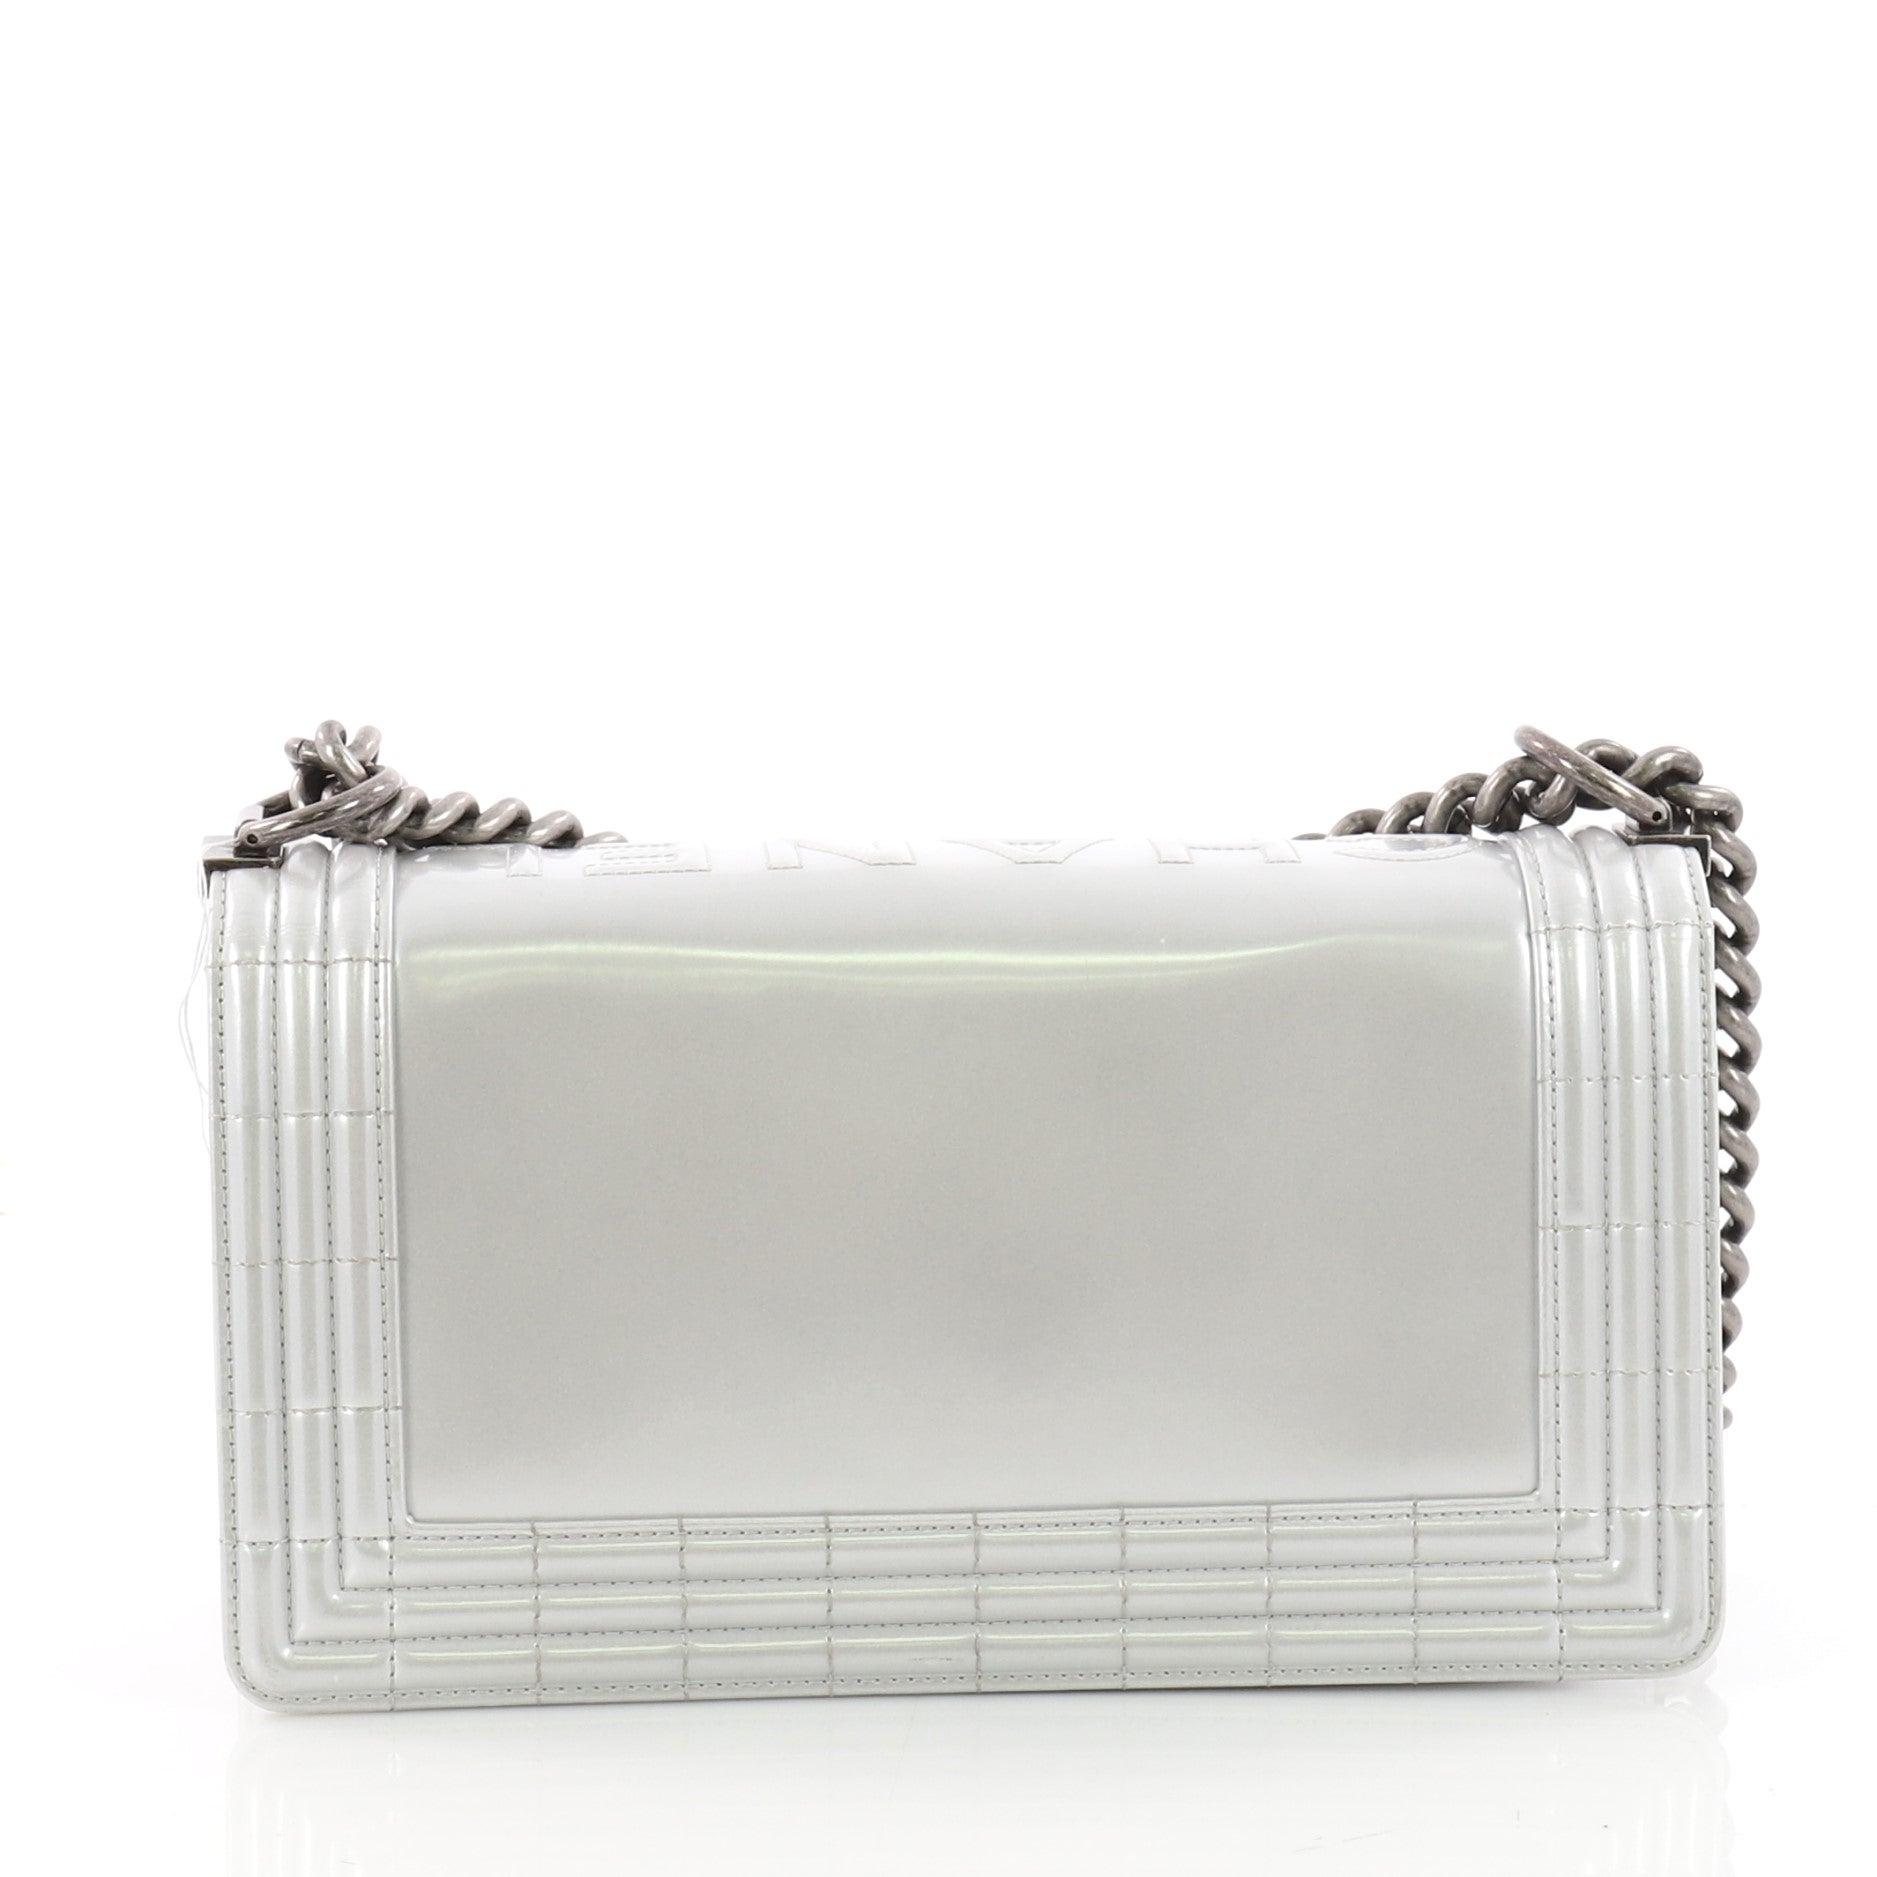 60cab26e1dd2b5 Chanel Reverso Boy Flap Bag Glazed Iridescent Calfskin Old Medium at 1stdibs